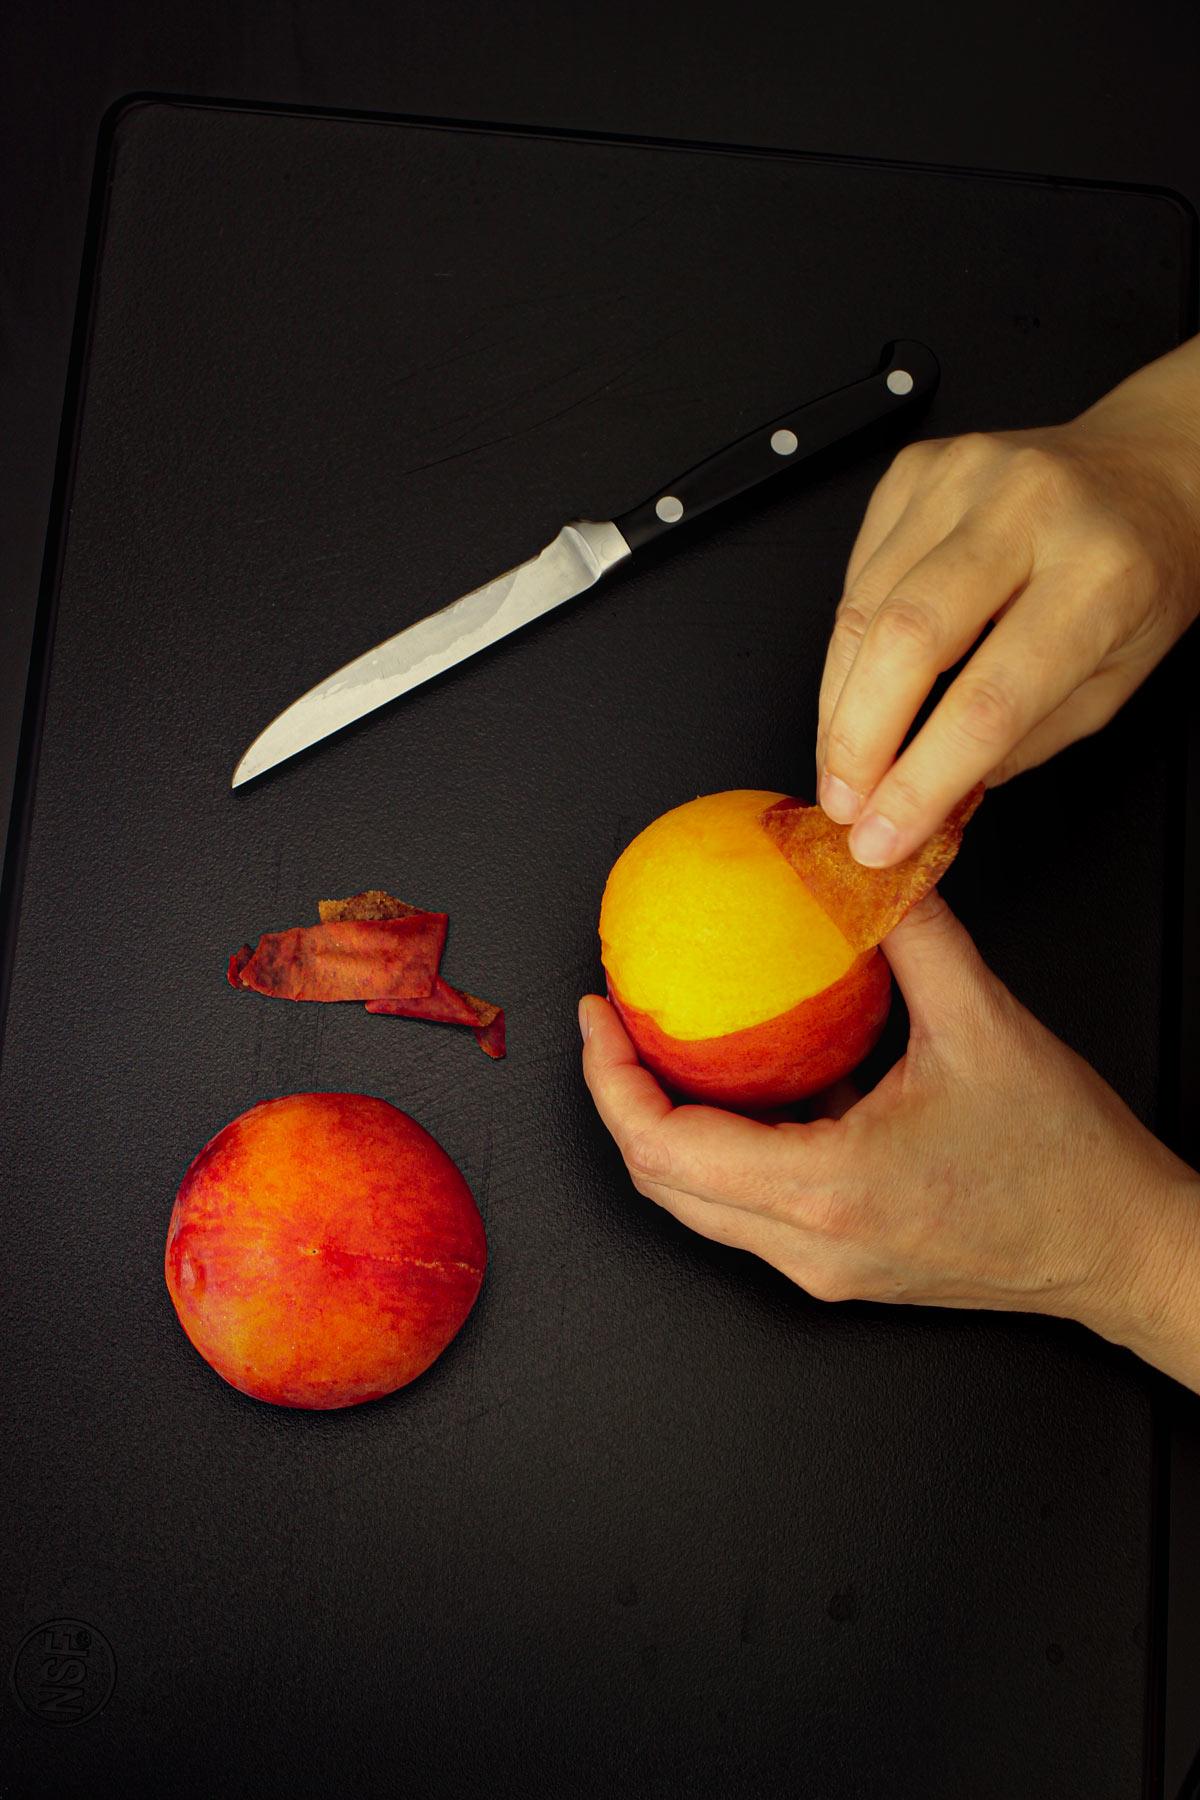 hand peeling skin from peach.